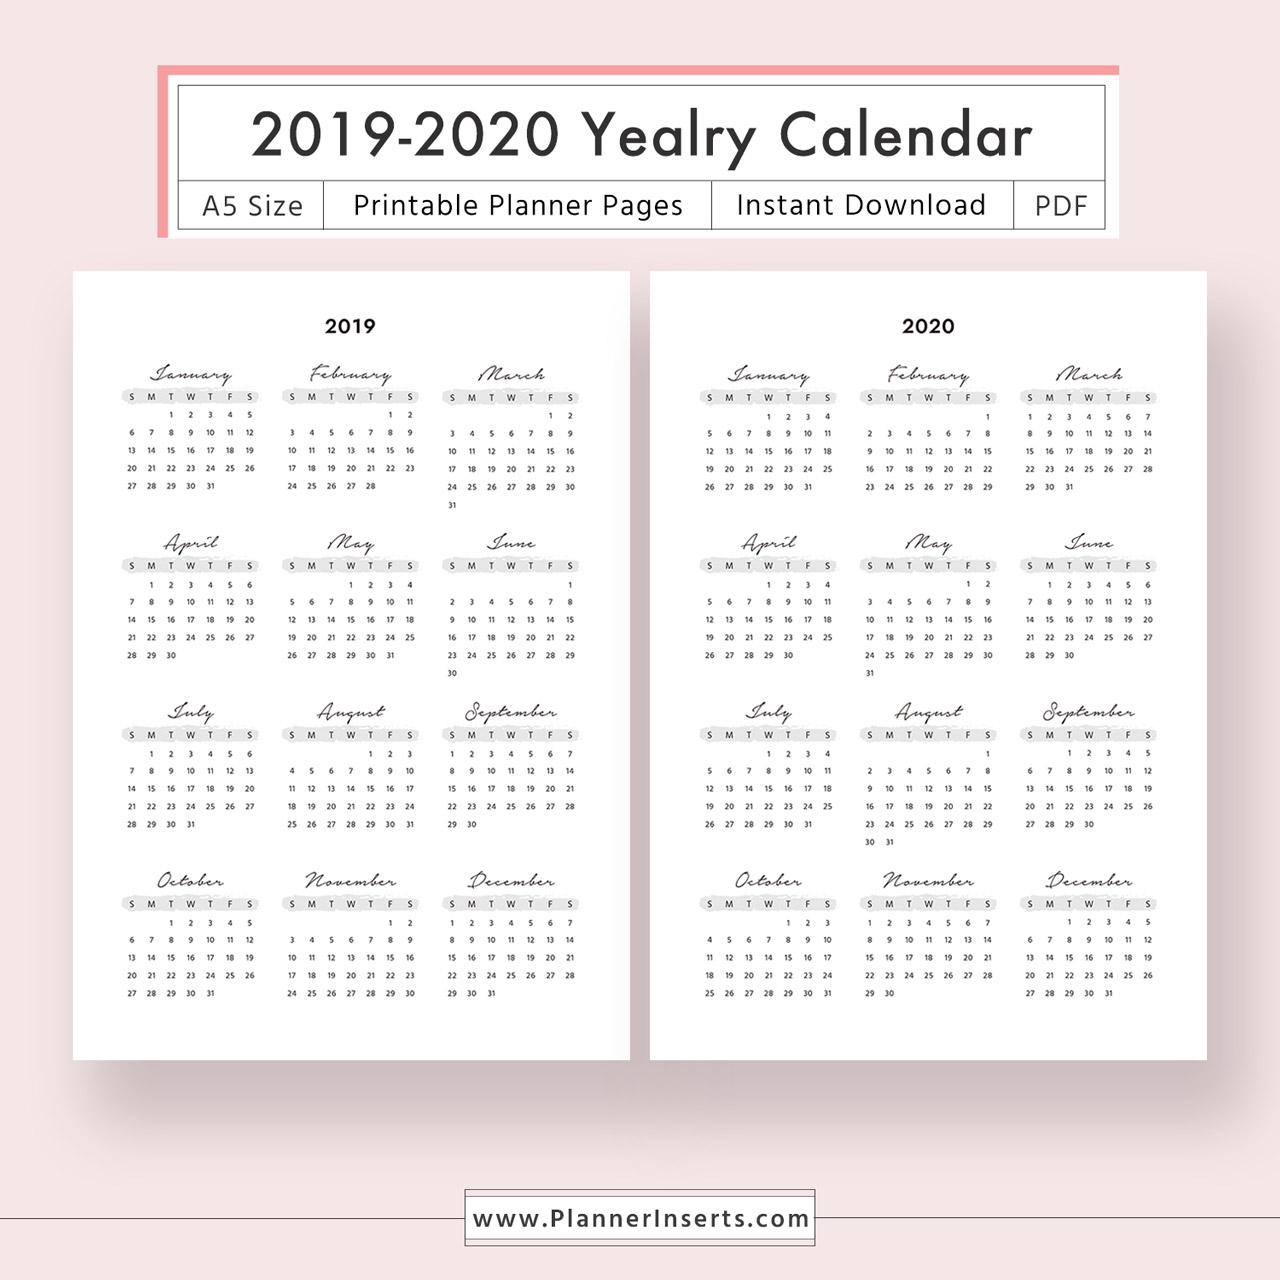 Year At A Glance 2020 - Colona.rsd7 regarding 2020 Year At A Glance Calendar